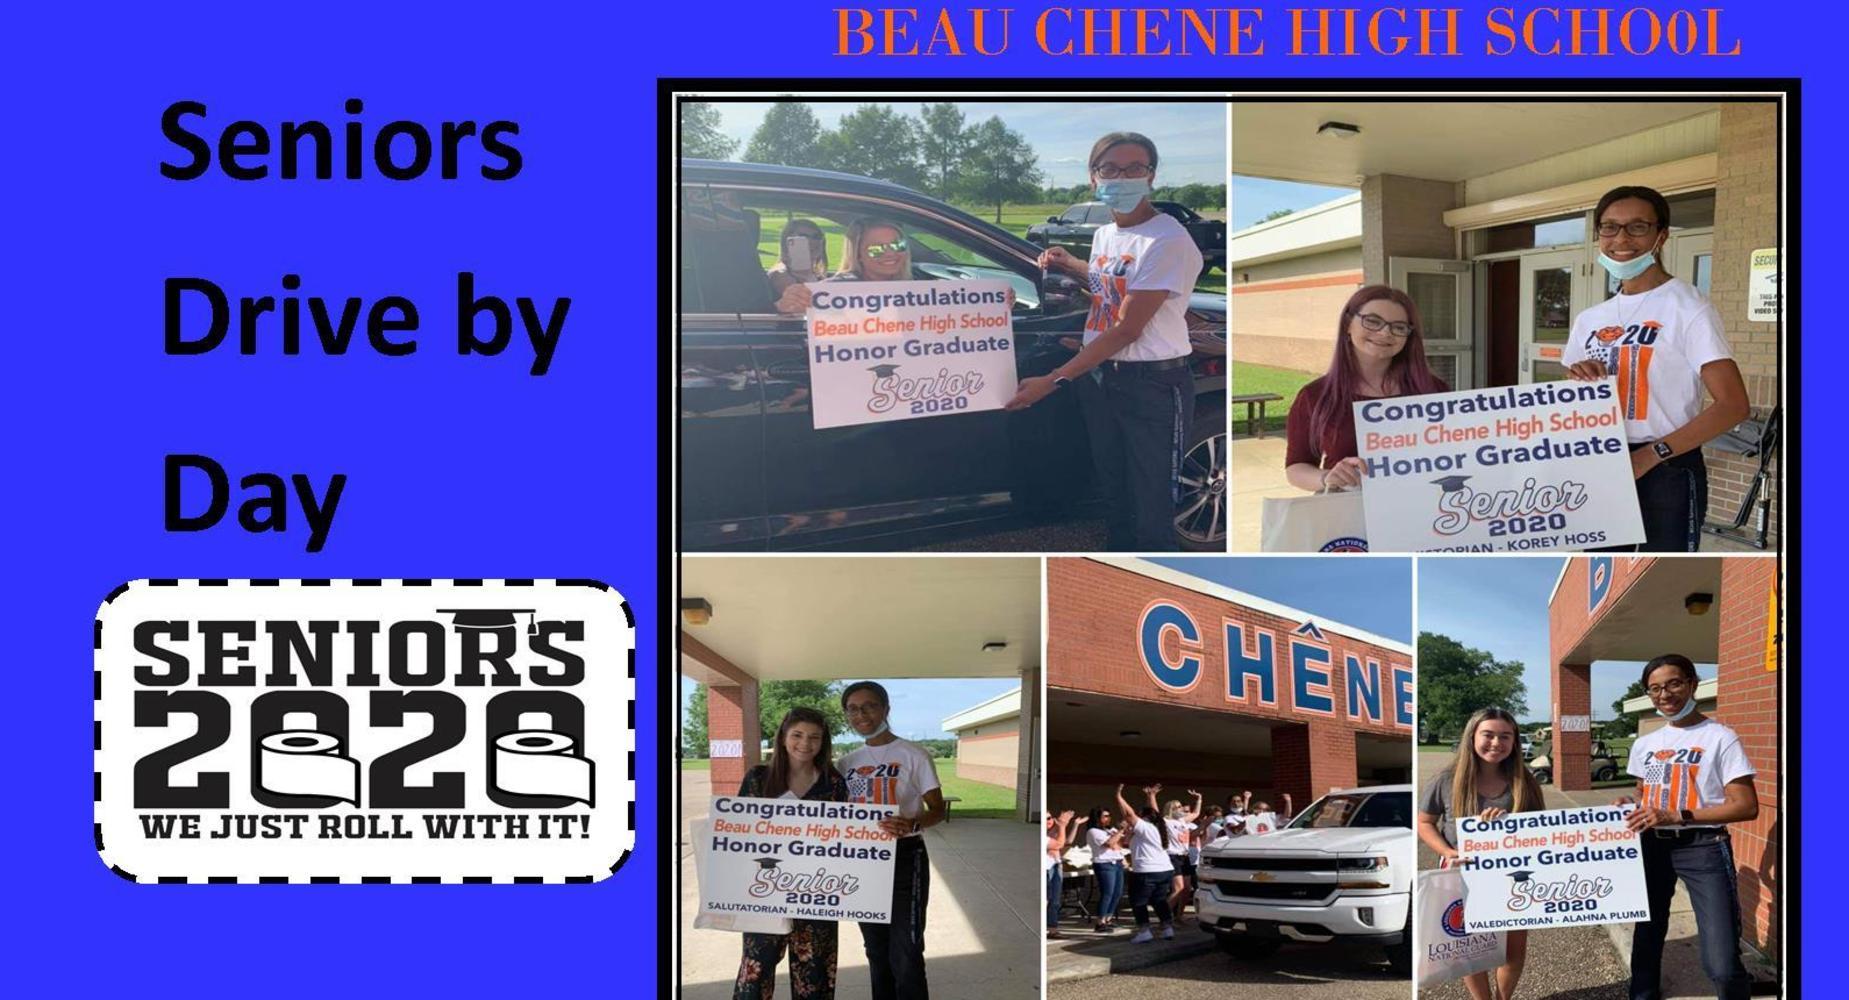 Seniors Drive By Day Celebration